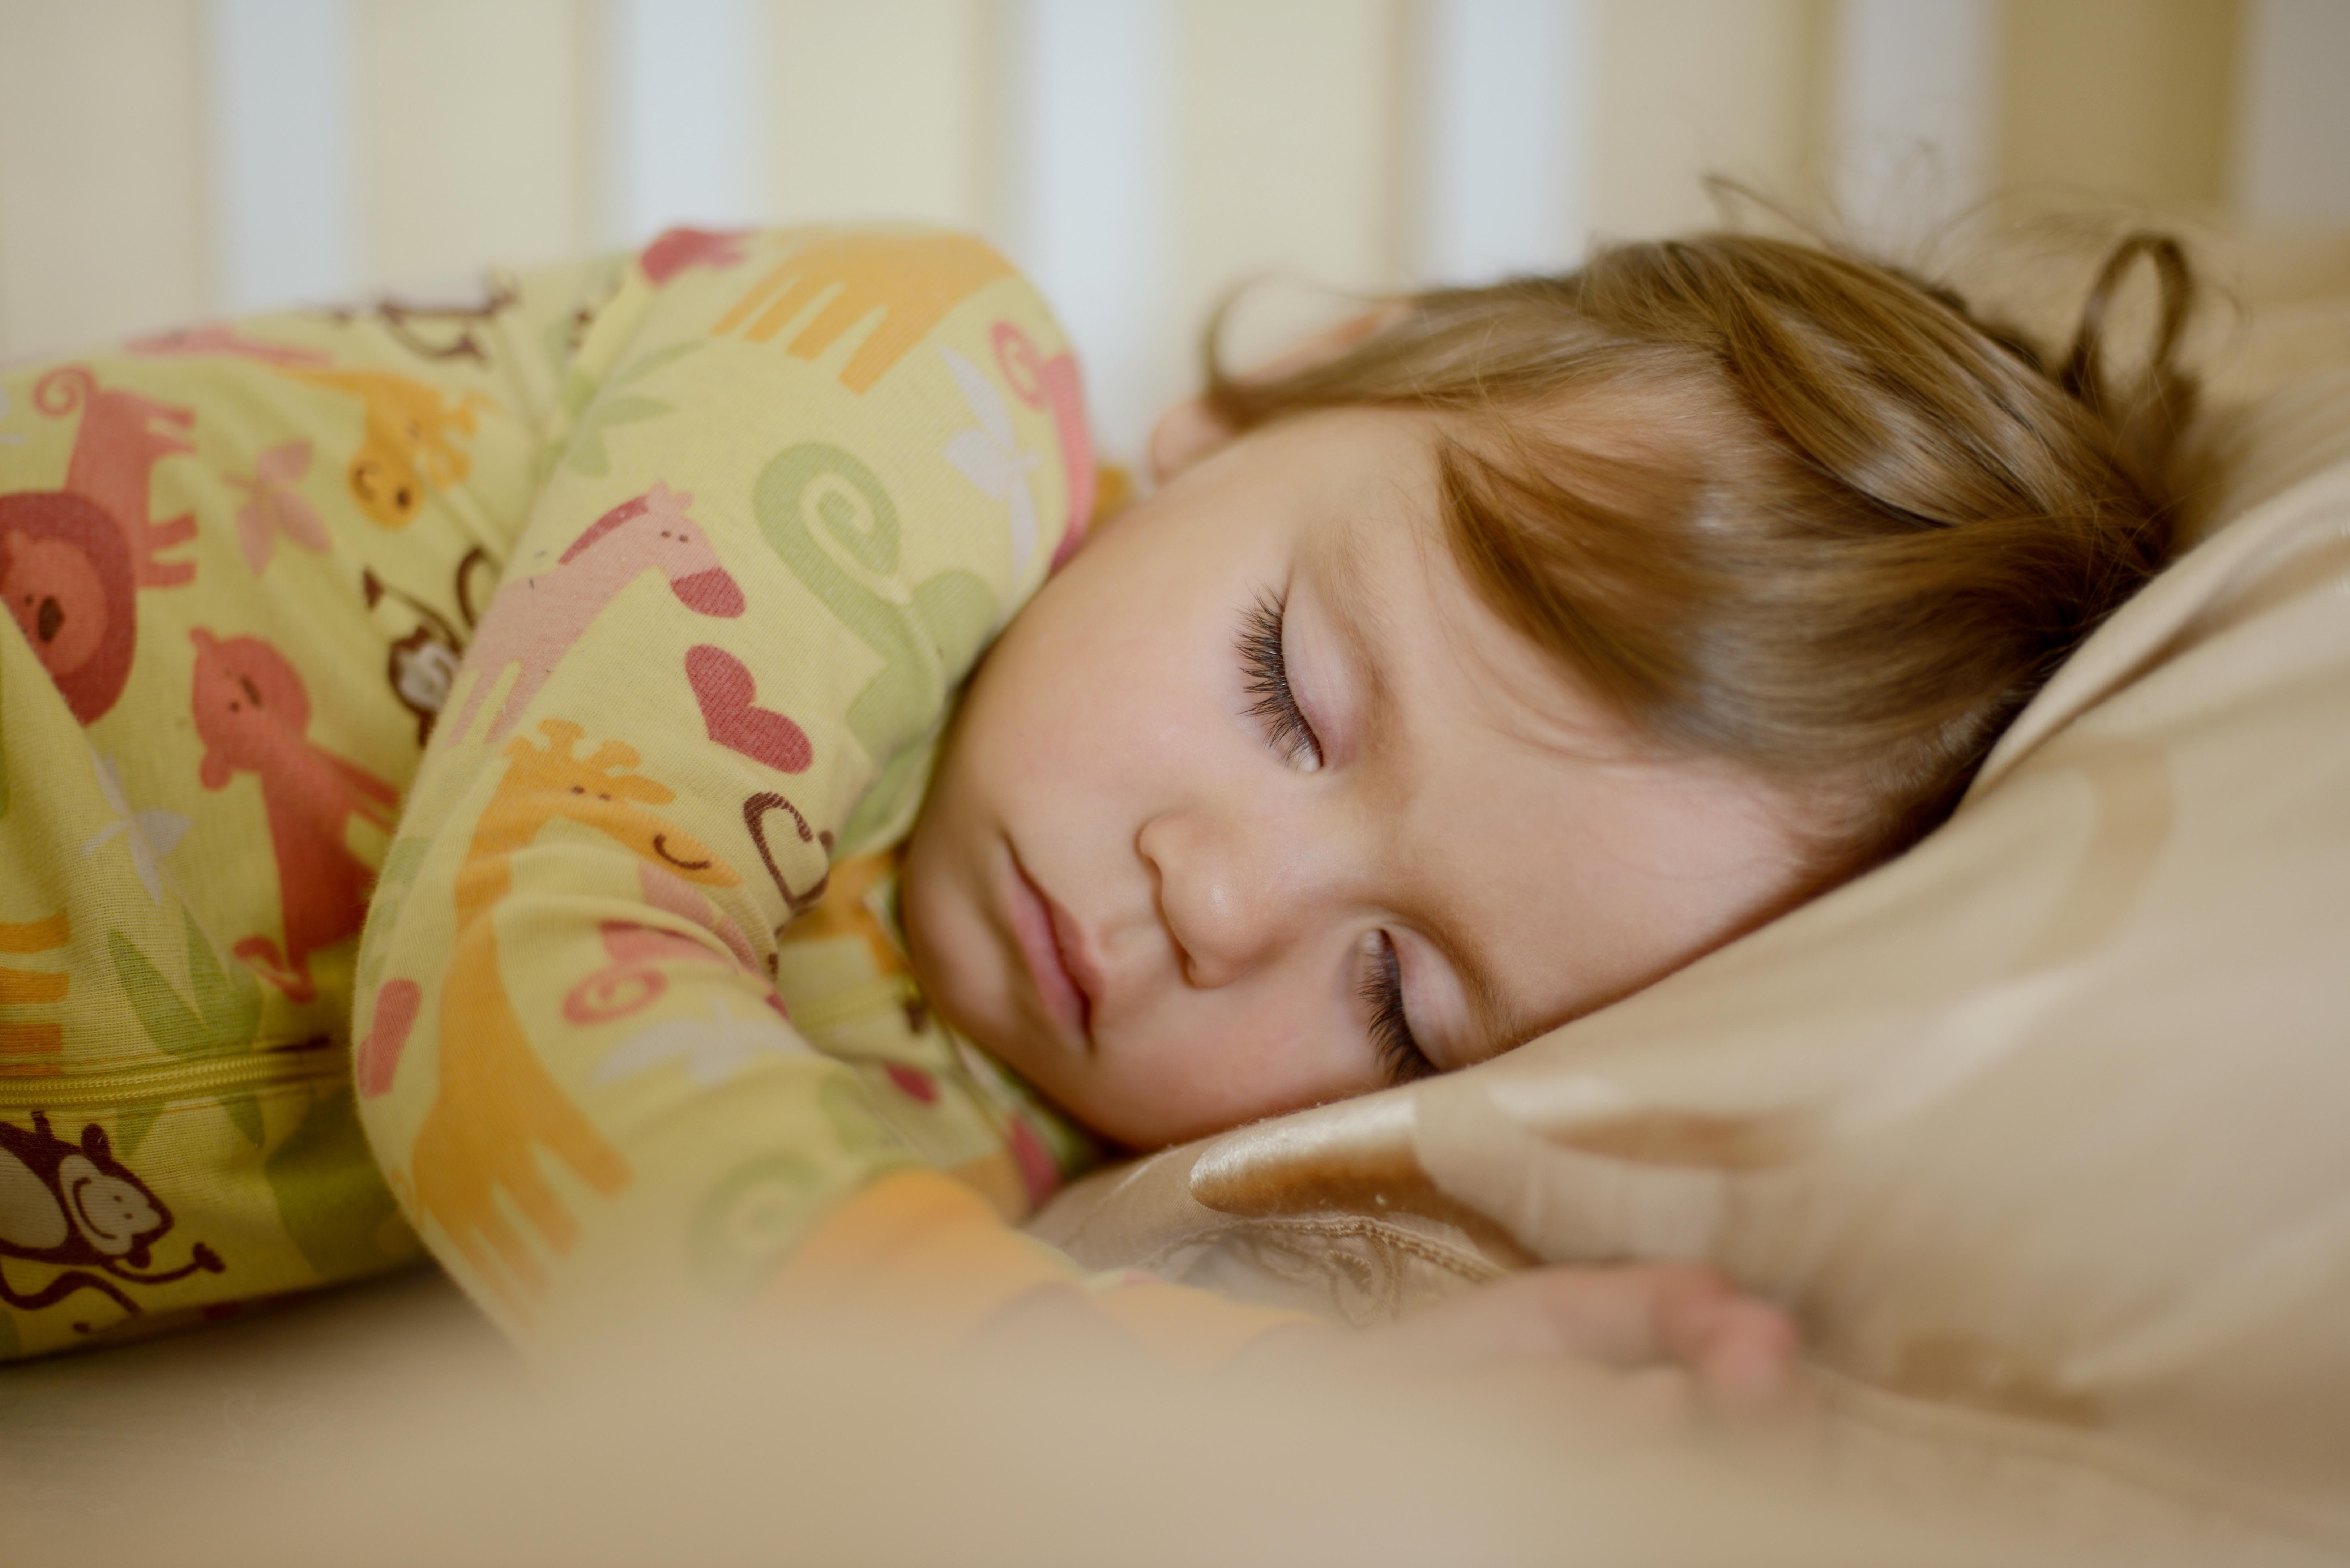 Сон видеть себя ребенком на фото